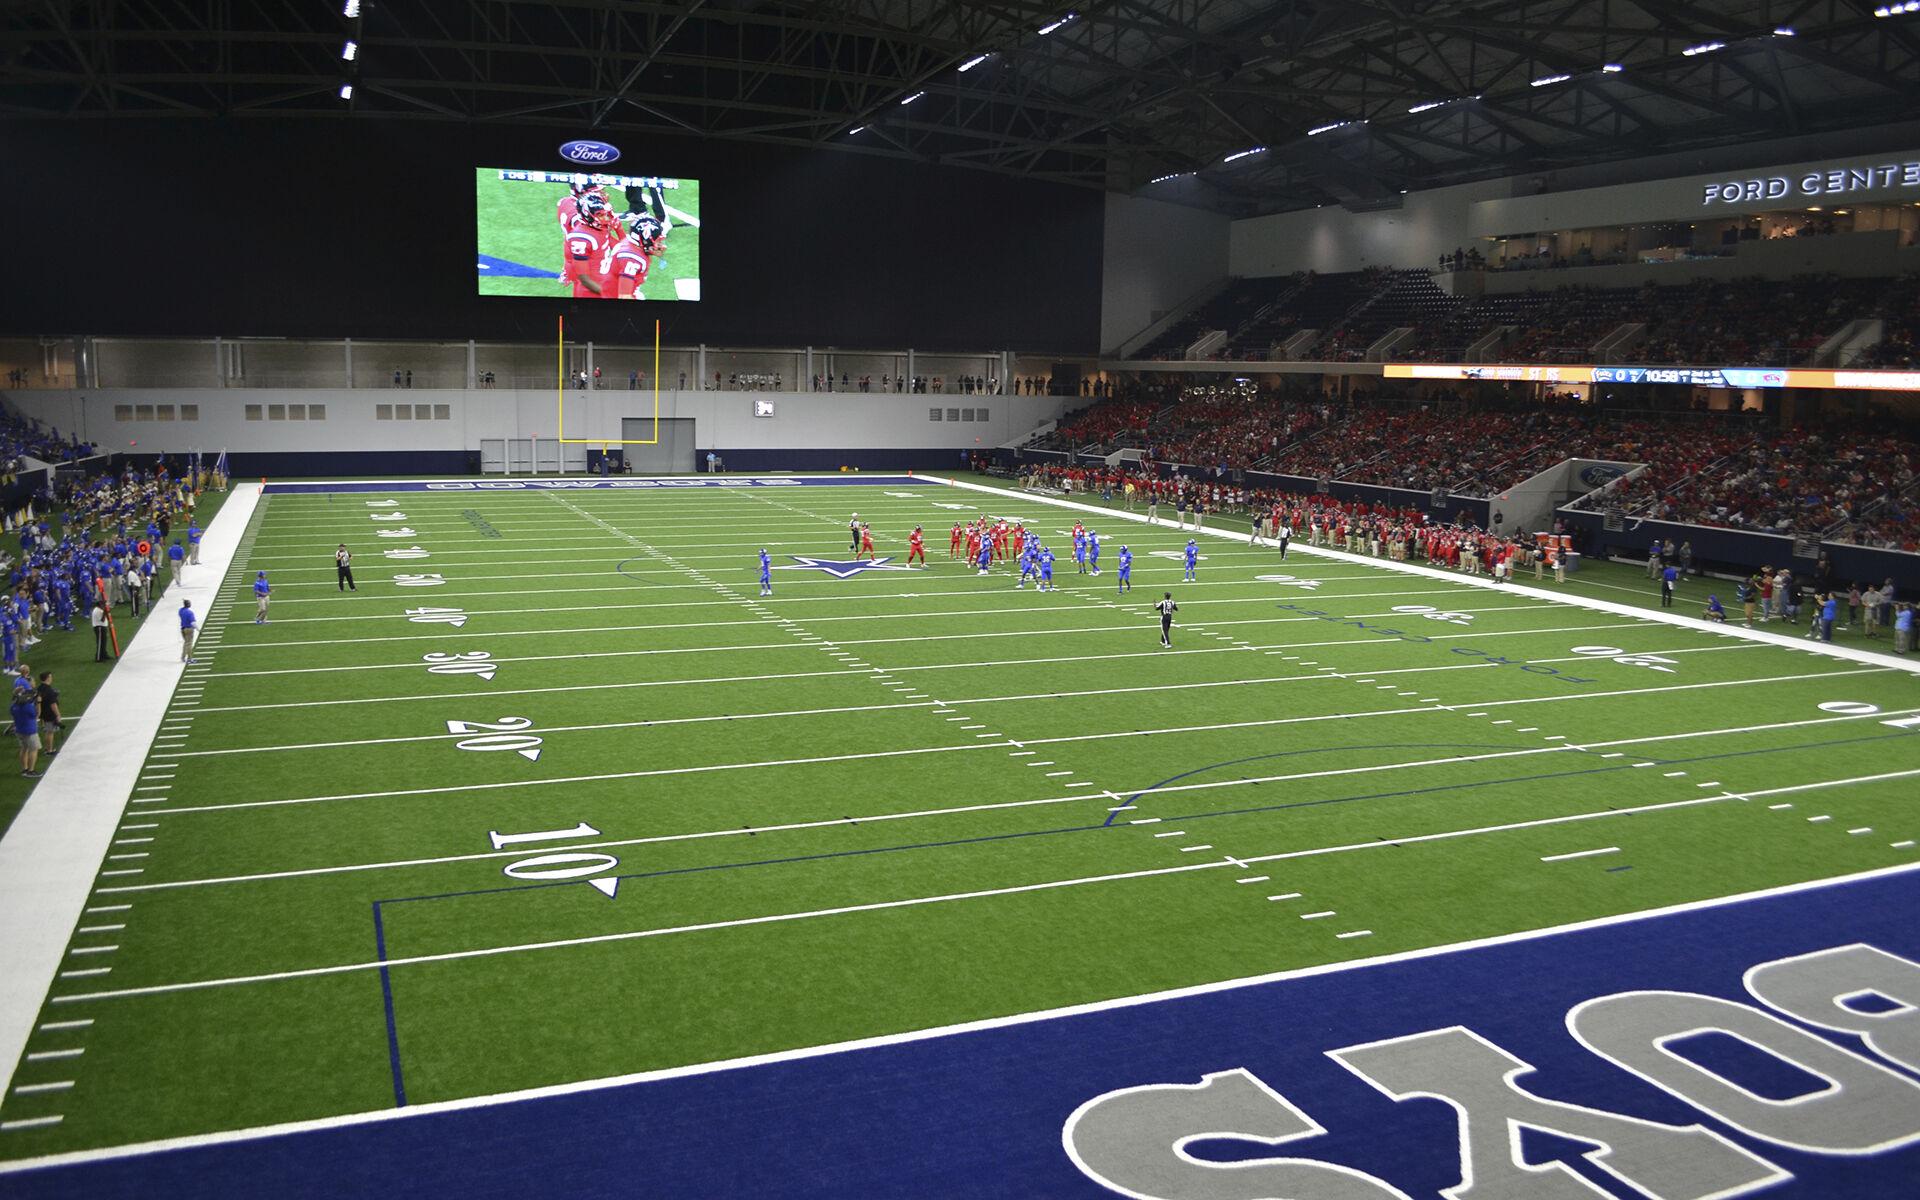 Ford Center Stadium & Training Facility - Dallas Cowboys